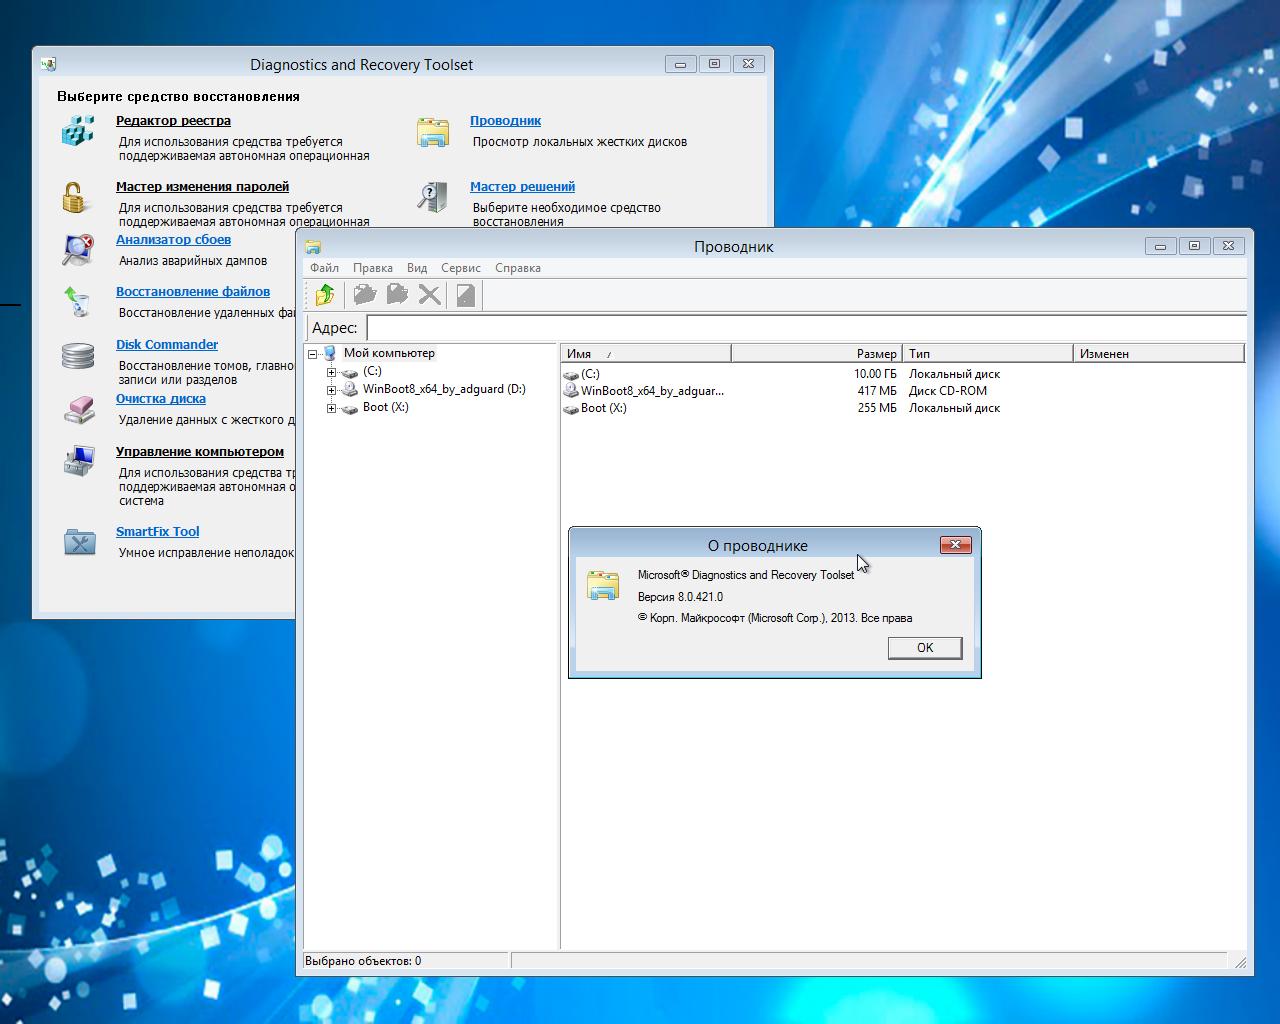 Windows rg edition - Winboot Mini 8 Cd V170723 By Adguard Rus Test Edition